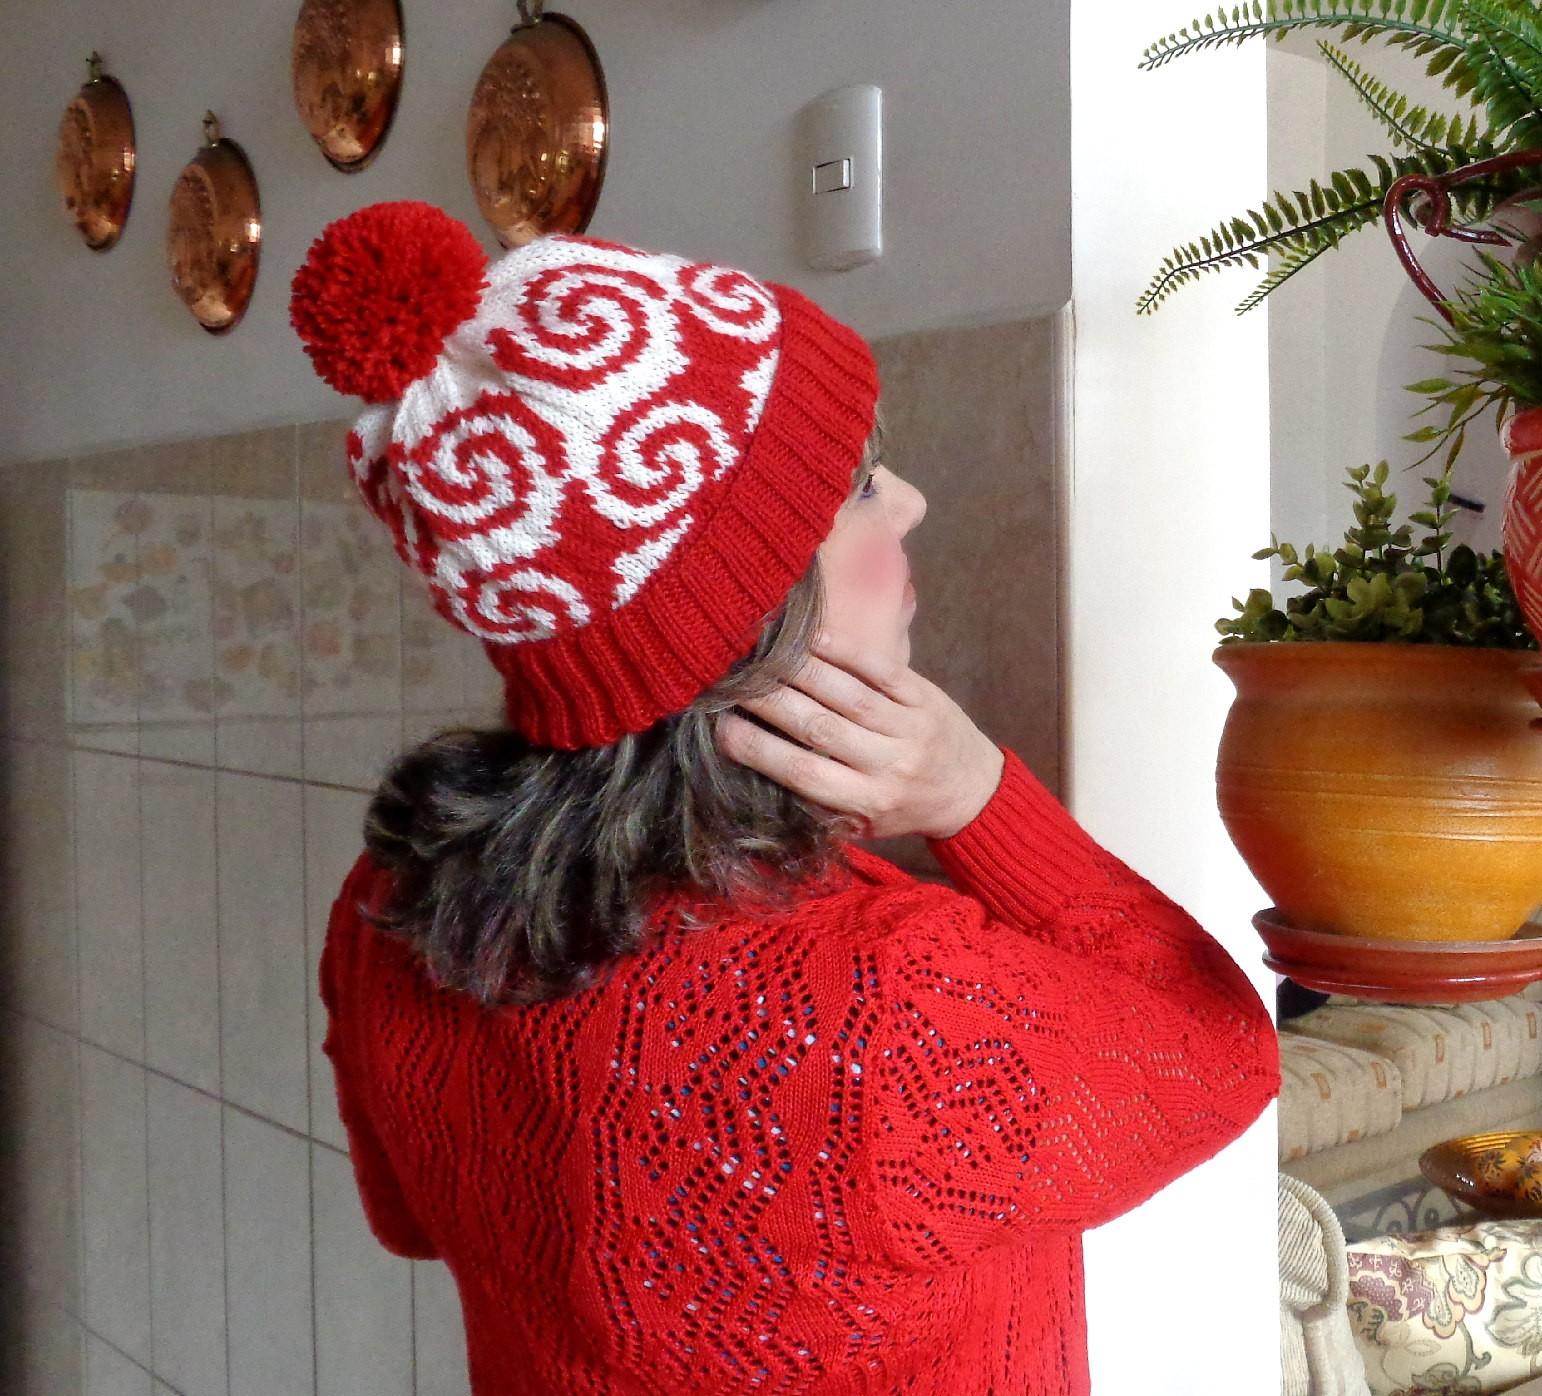 cozy knitting hat with pompom pattern